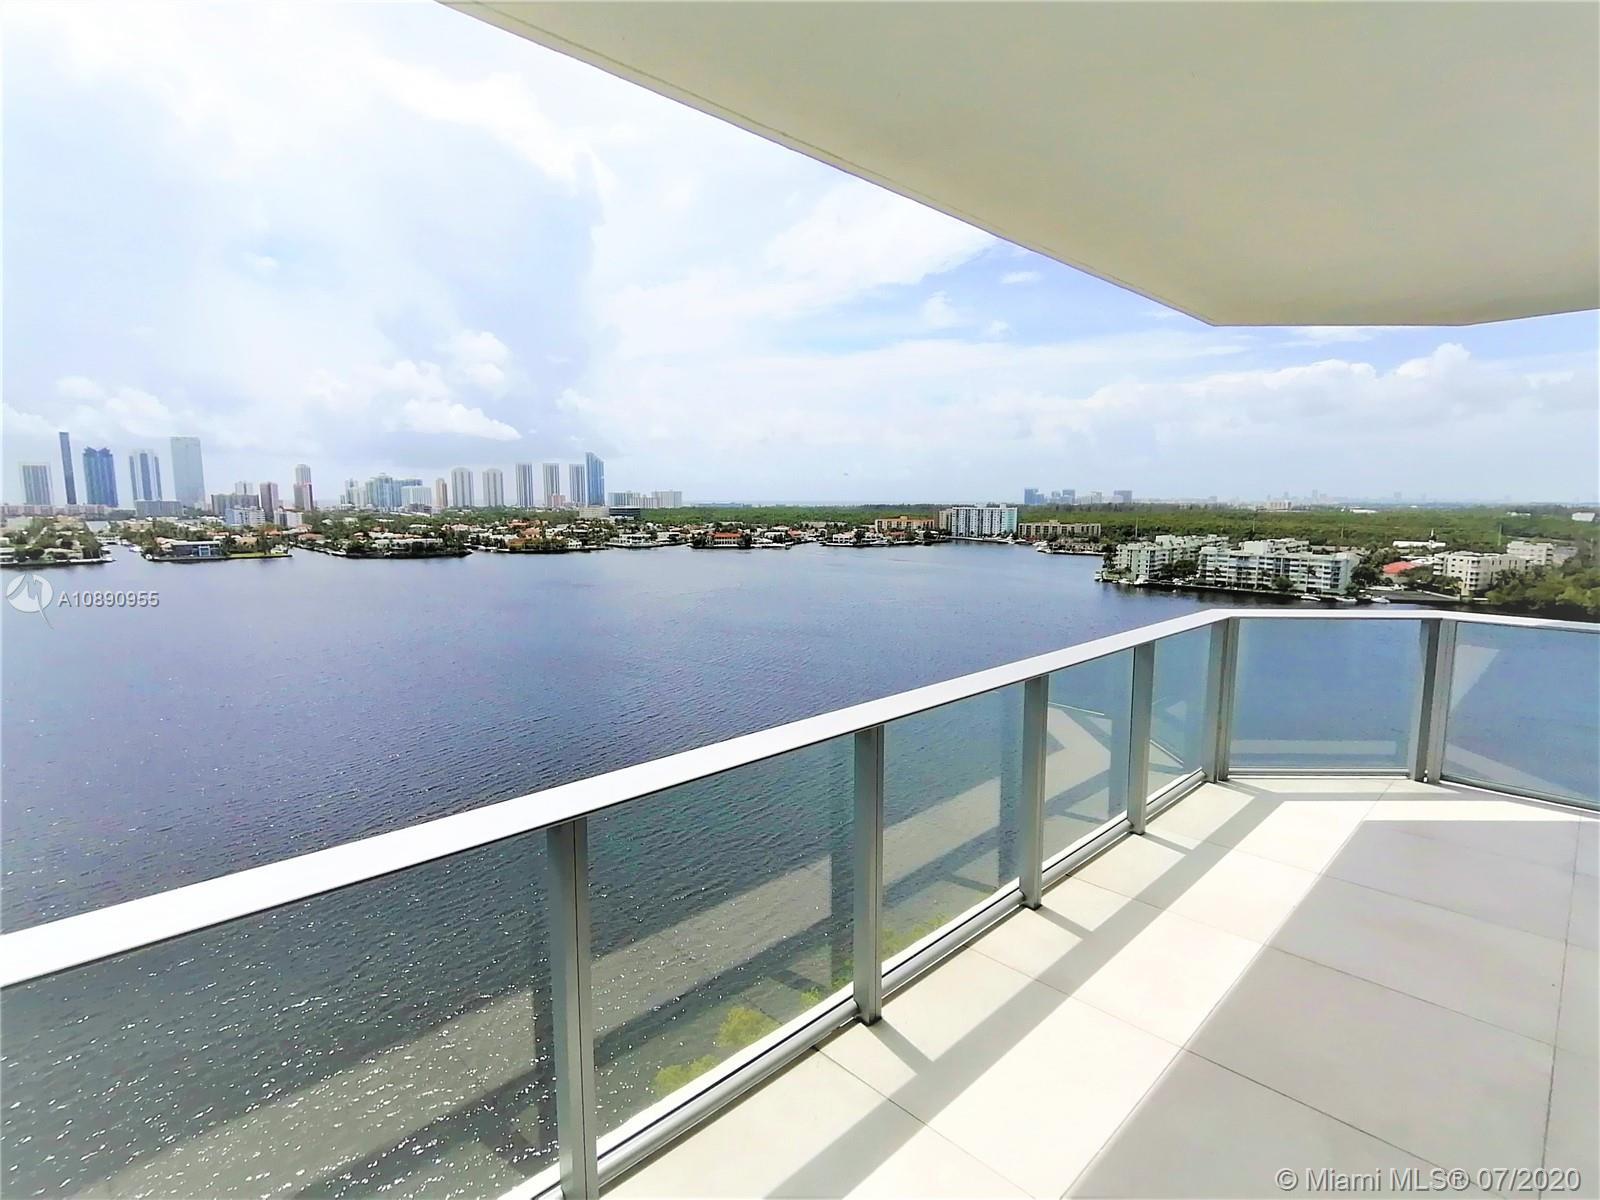 Real Estate Photo A10890955